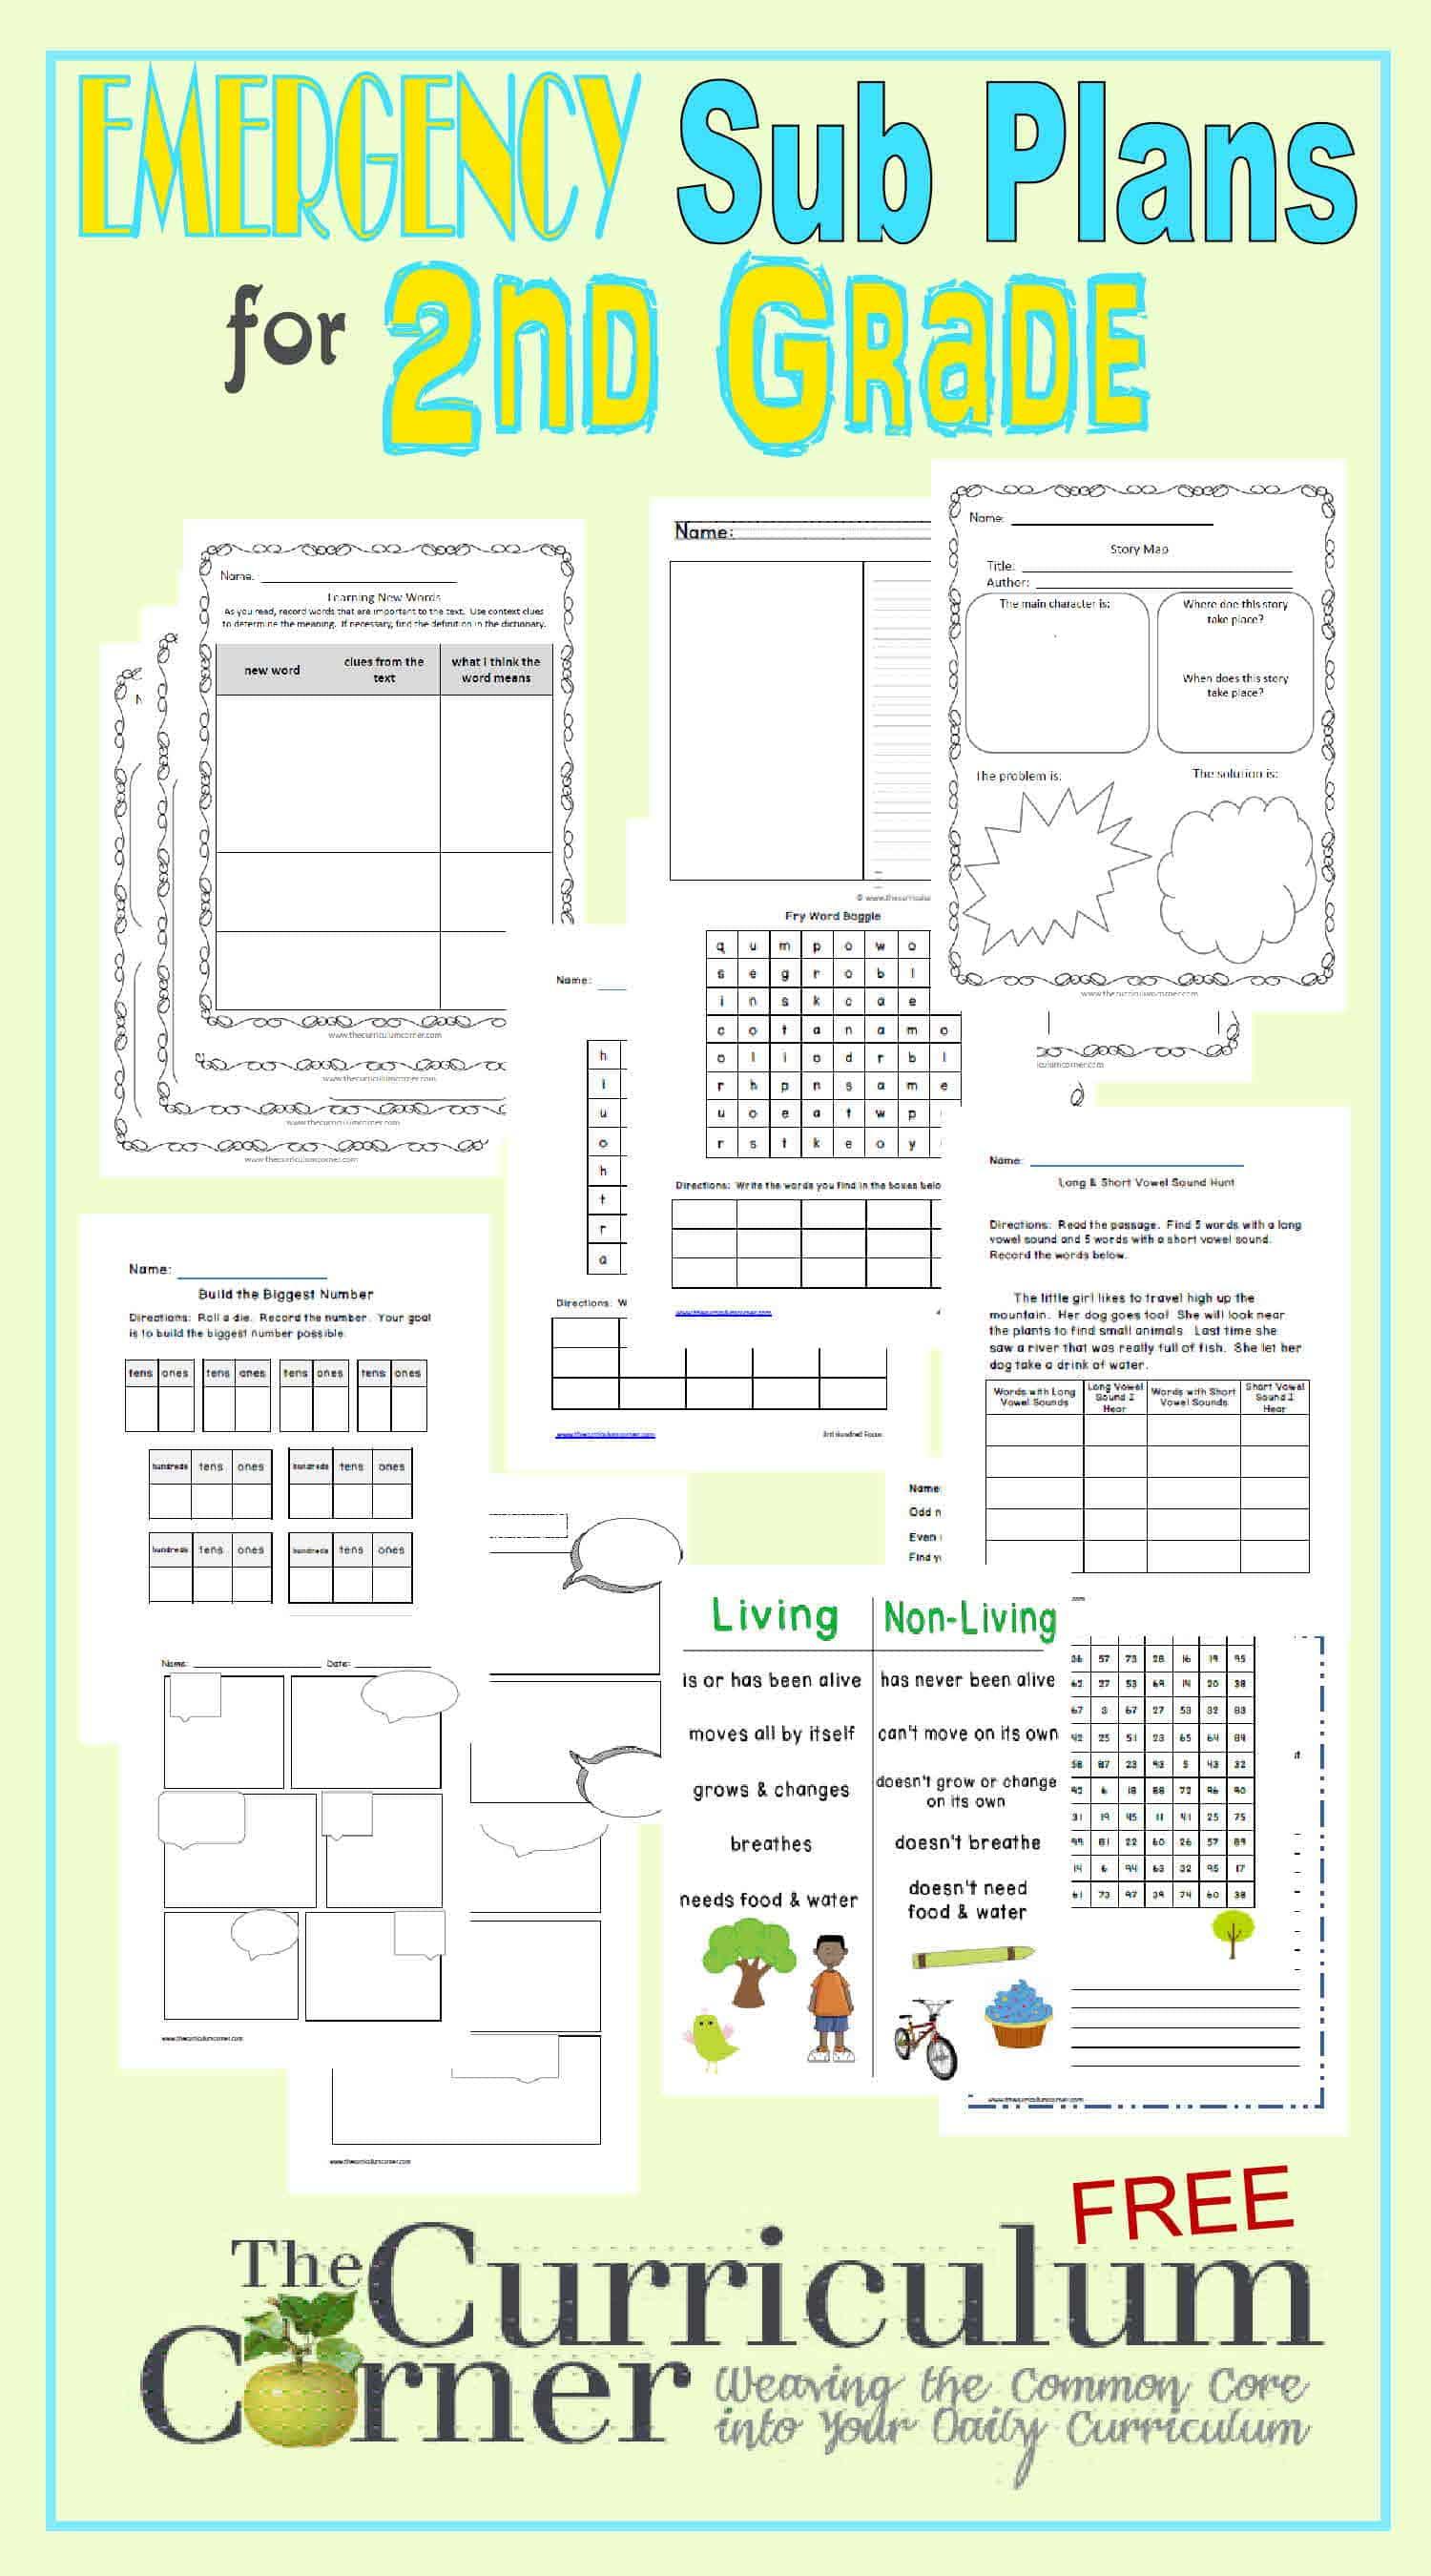 2nd Grade Emergency Sub Plans - The Curriculum Corner 123 [ 2700 x 1500 Pixel ]